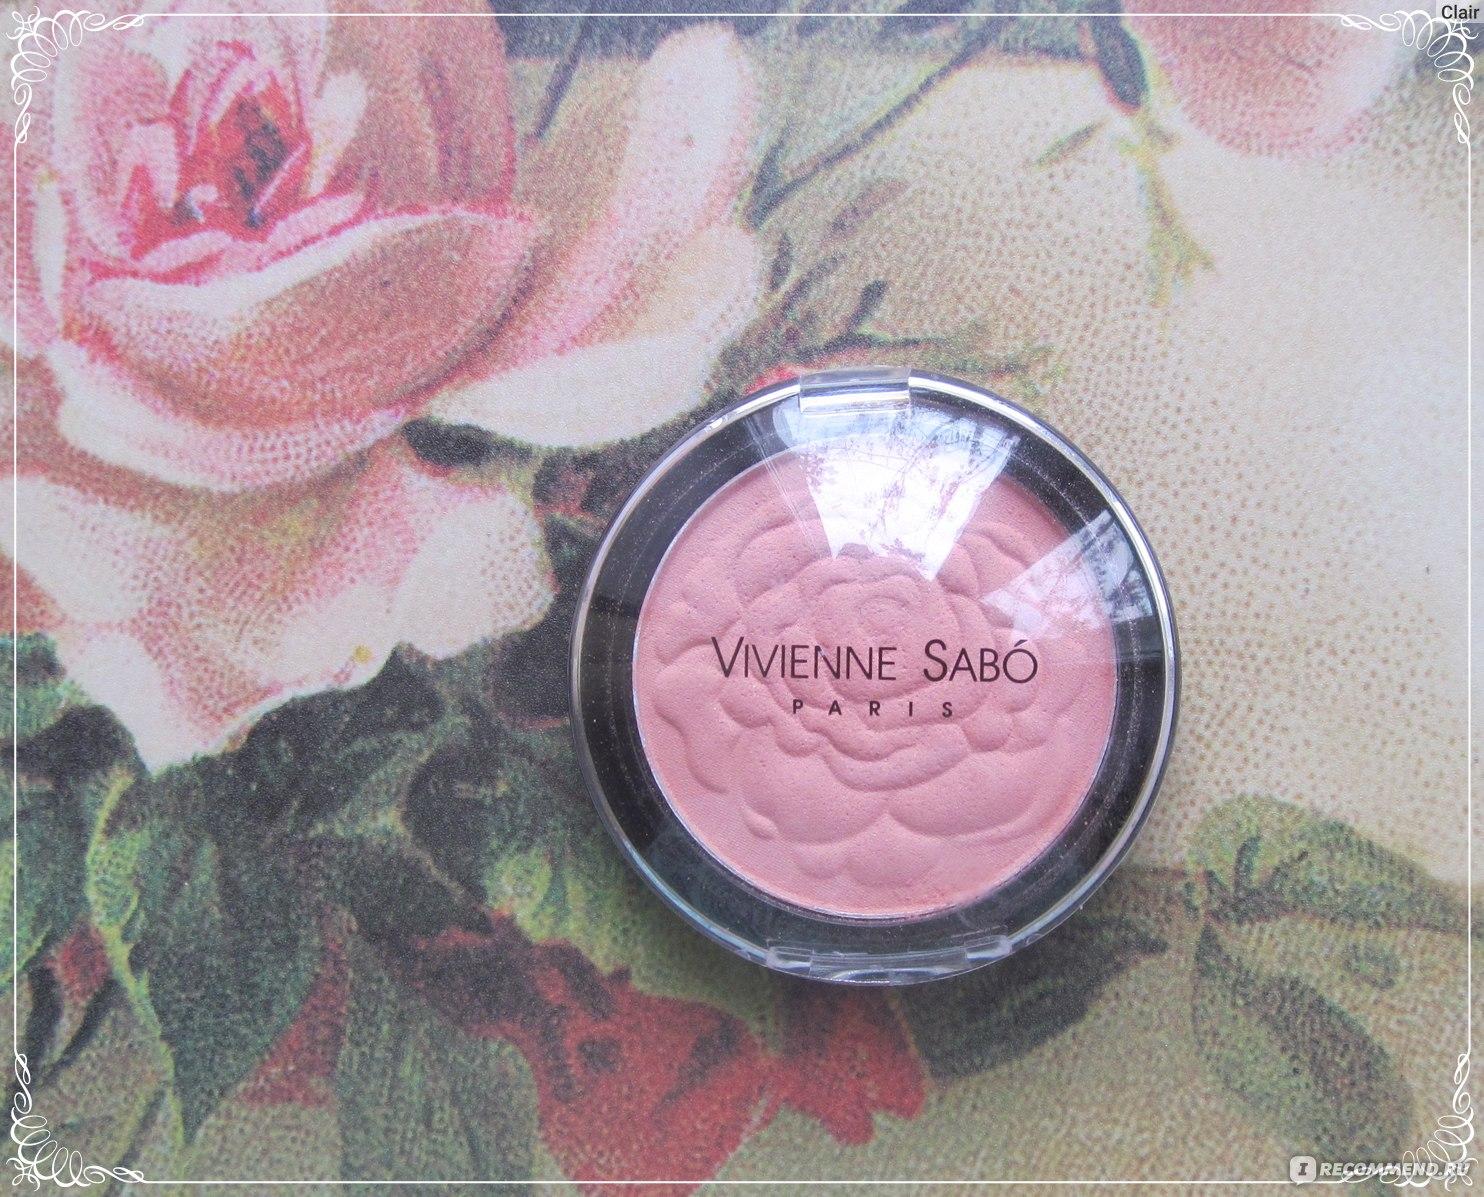 e65db336a Румяна Vivienne sabo Rose de Velours - «Естественность в моде, а ...